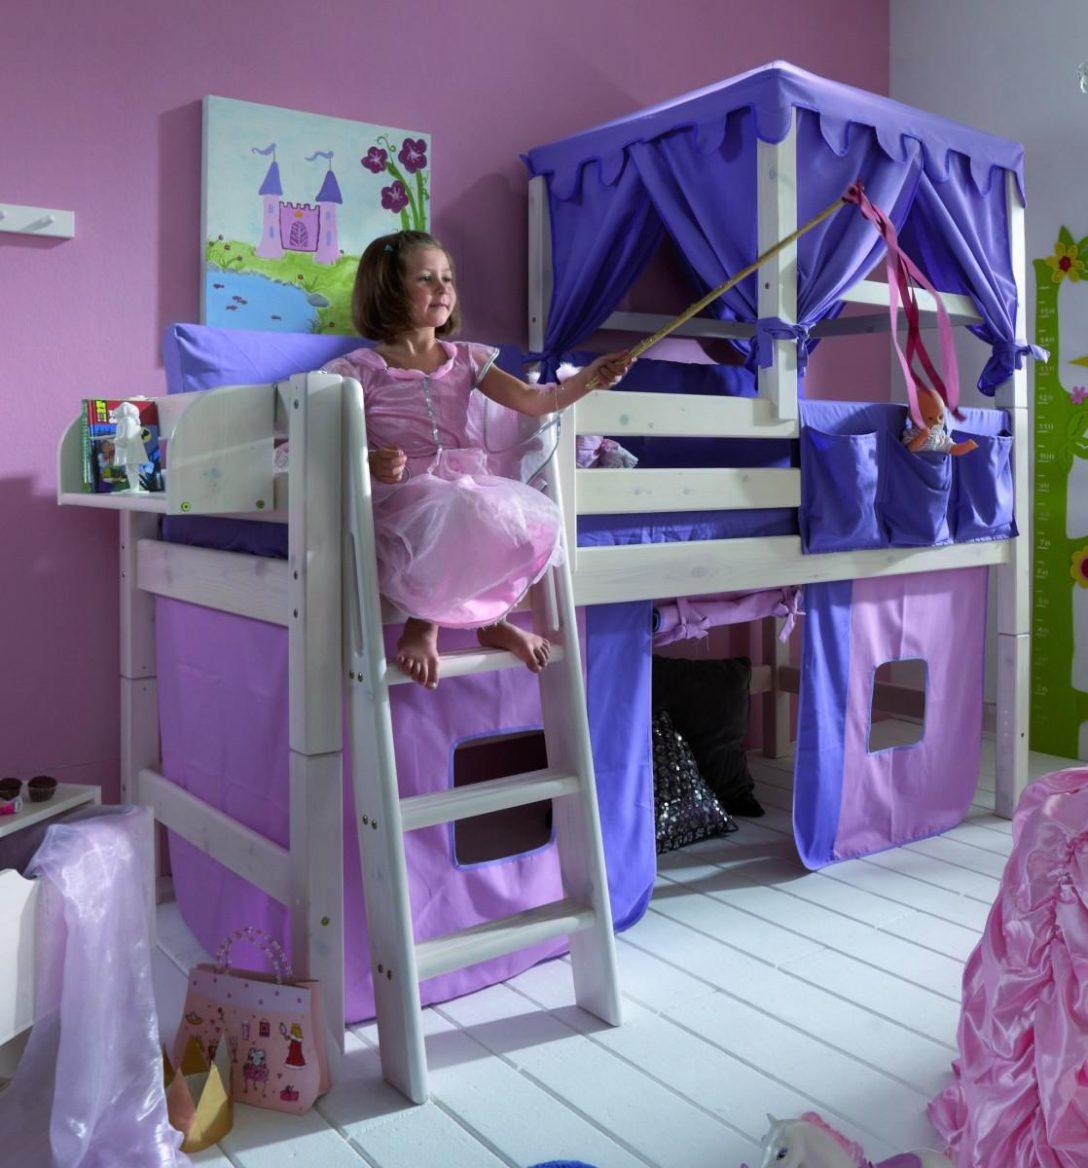 Large Size of Kinderbett Mädchen 5383ea3b29a8c Betten Bett Wohnzimmer Kinderbett Mädchen